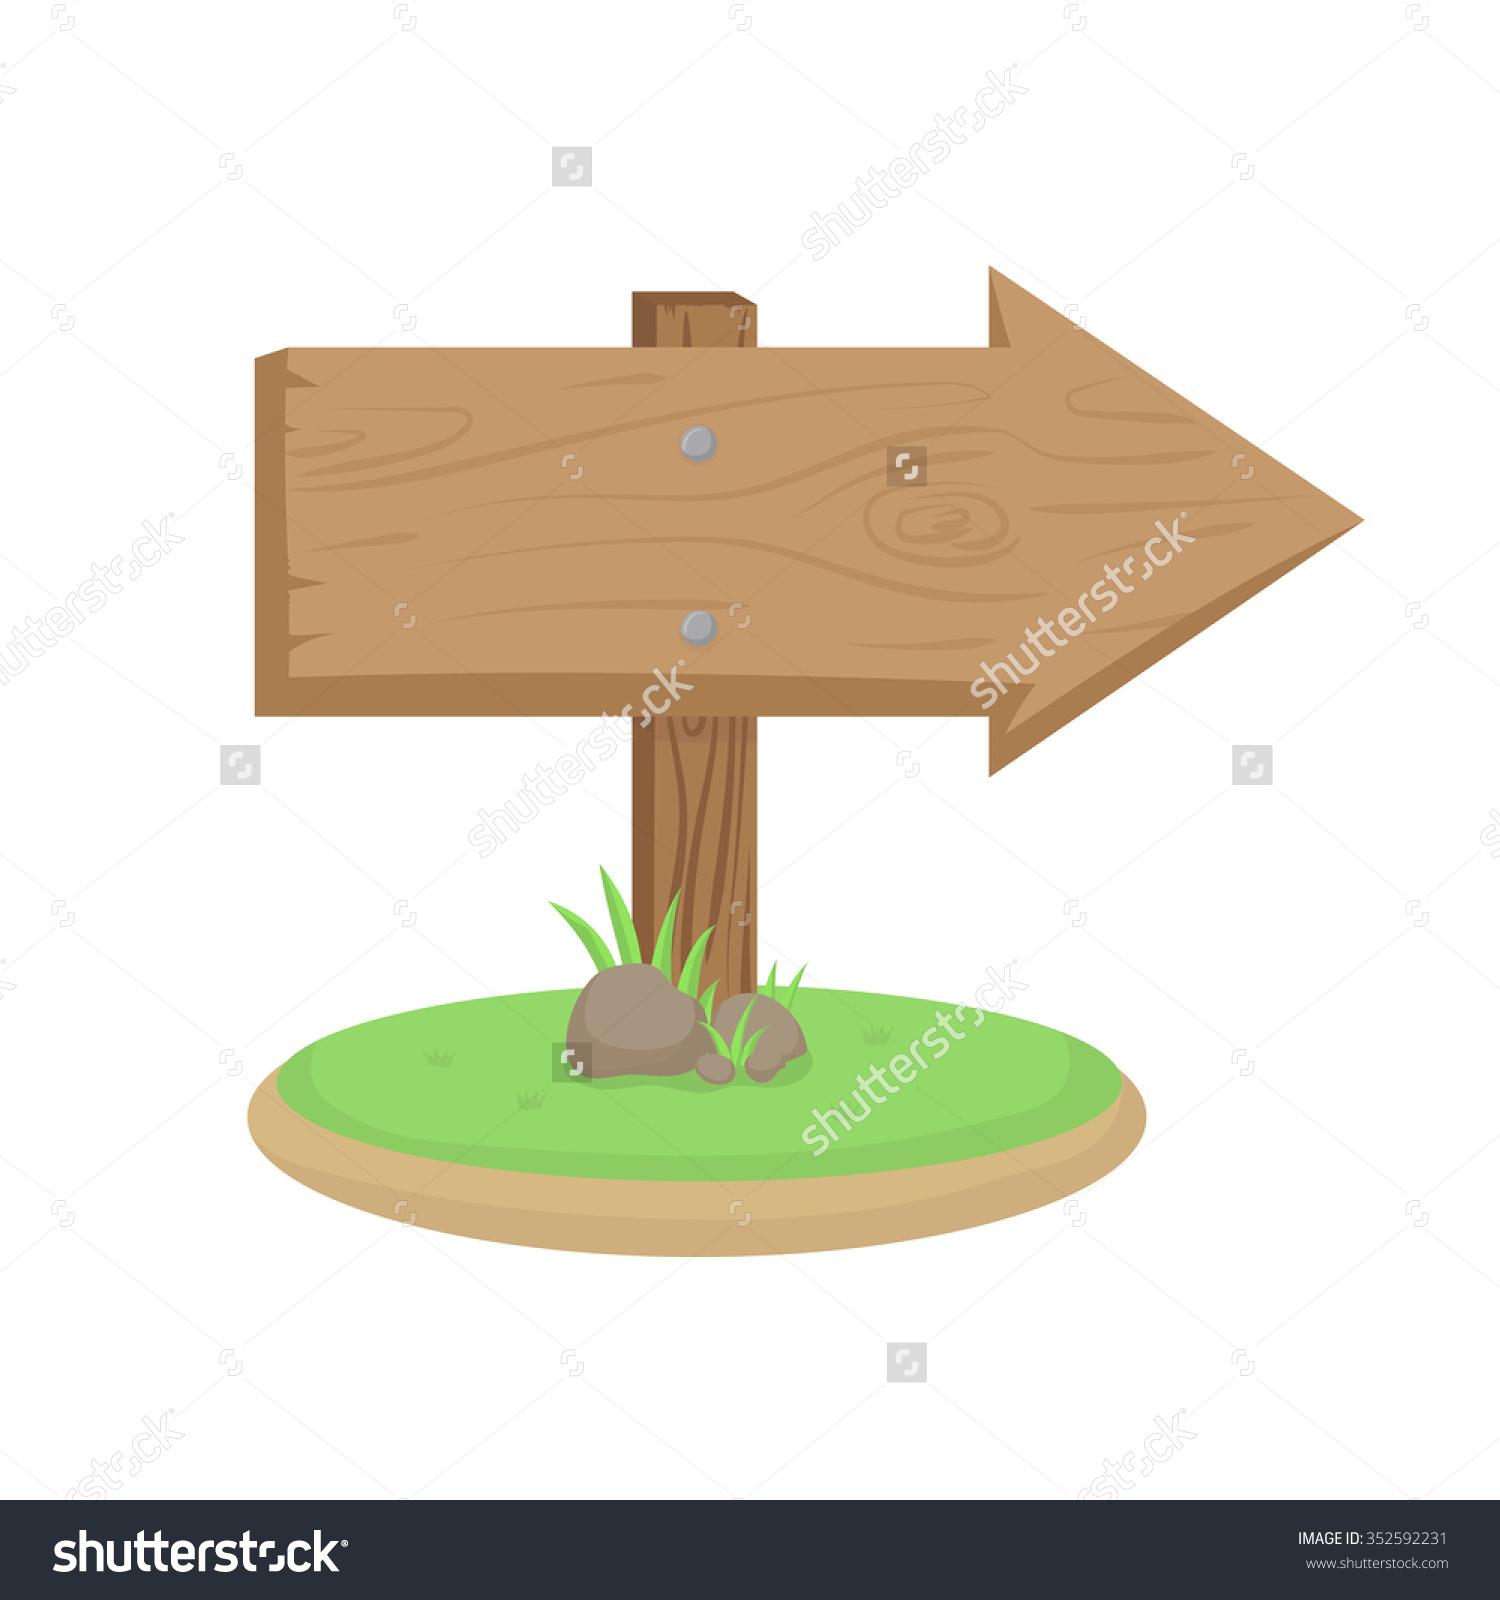 Cartoon Clip Art Wooden Direction Sign Stock Vector 352592231.